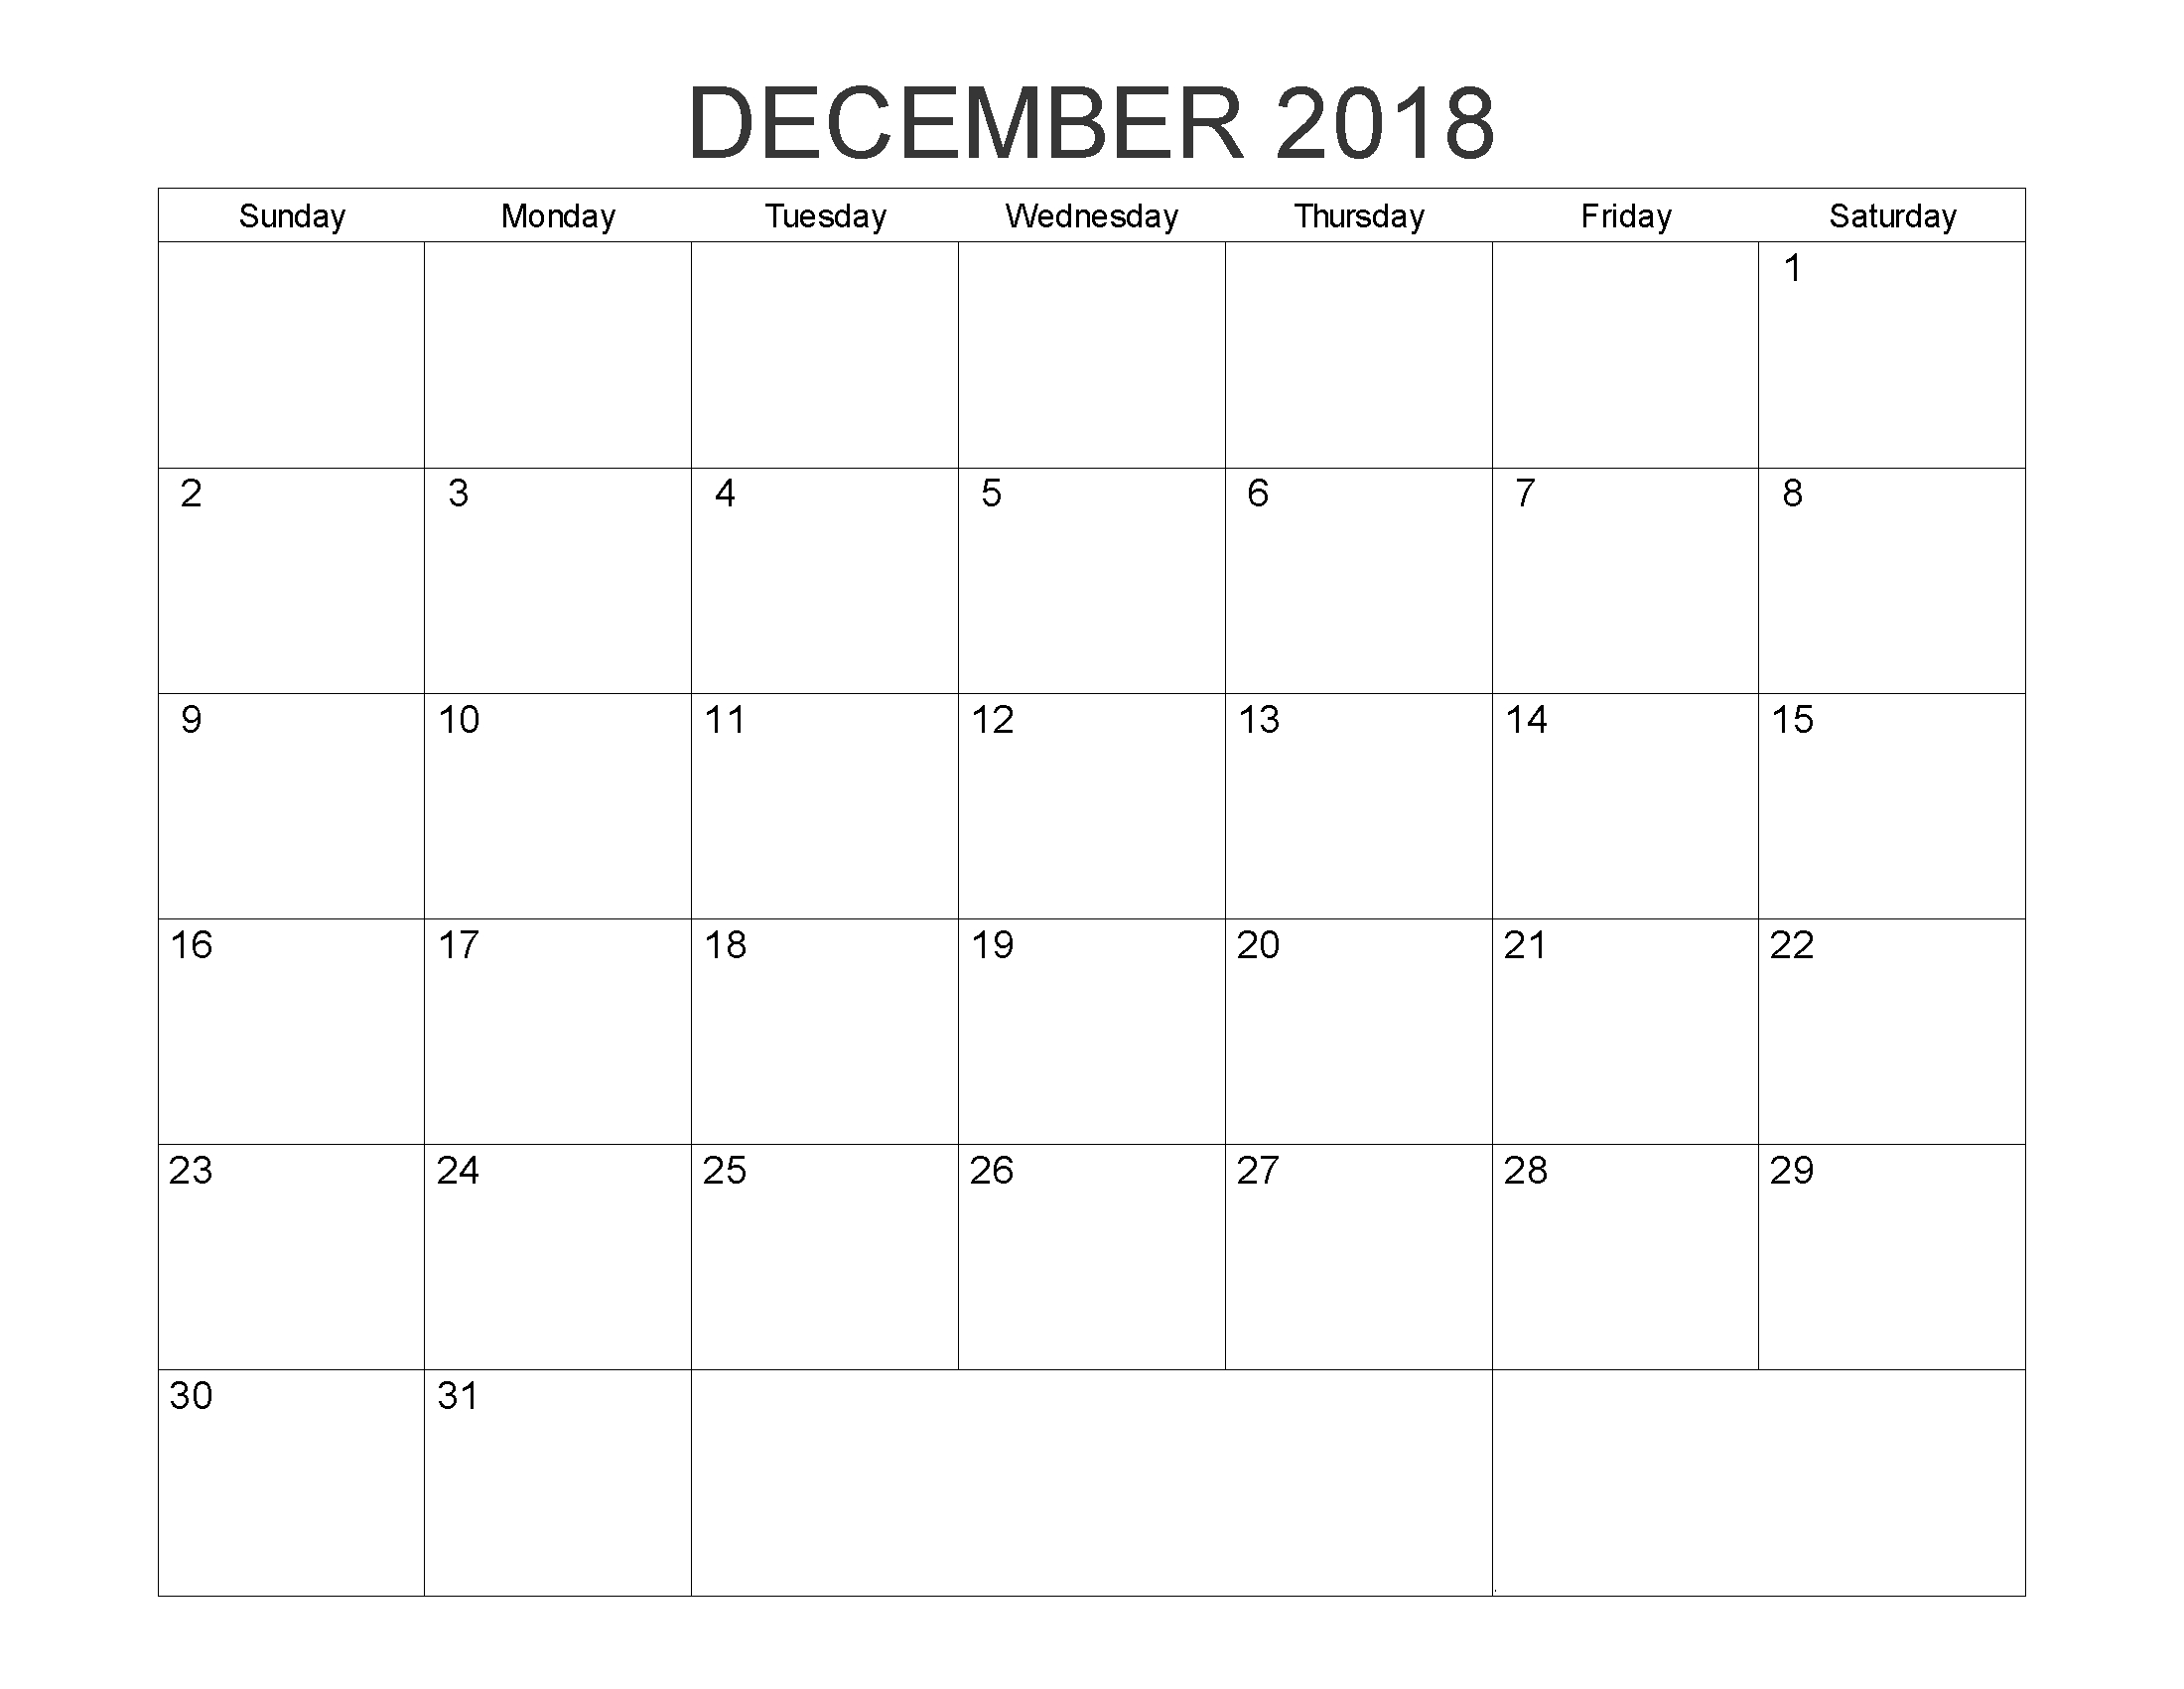 December 2018 Editable Word Calendar | 2018 Calendars | August Month inside August-December Calendar Template